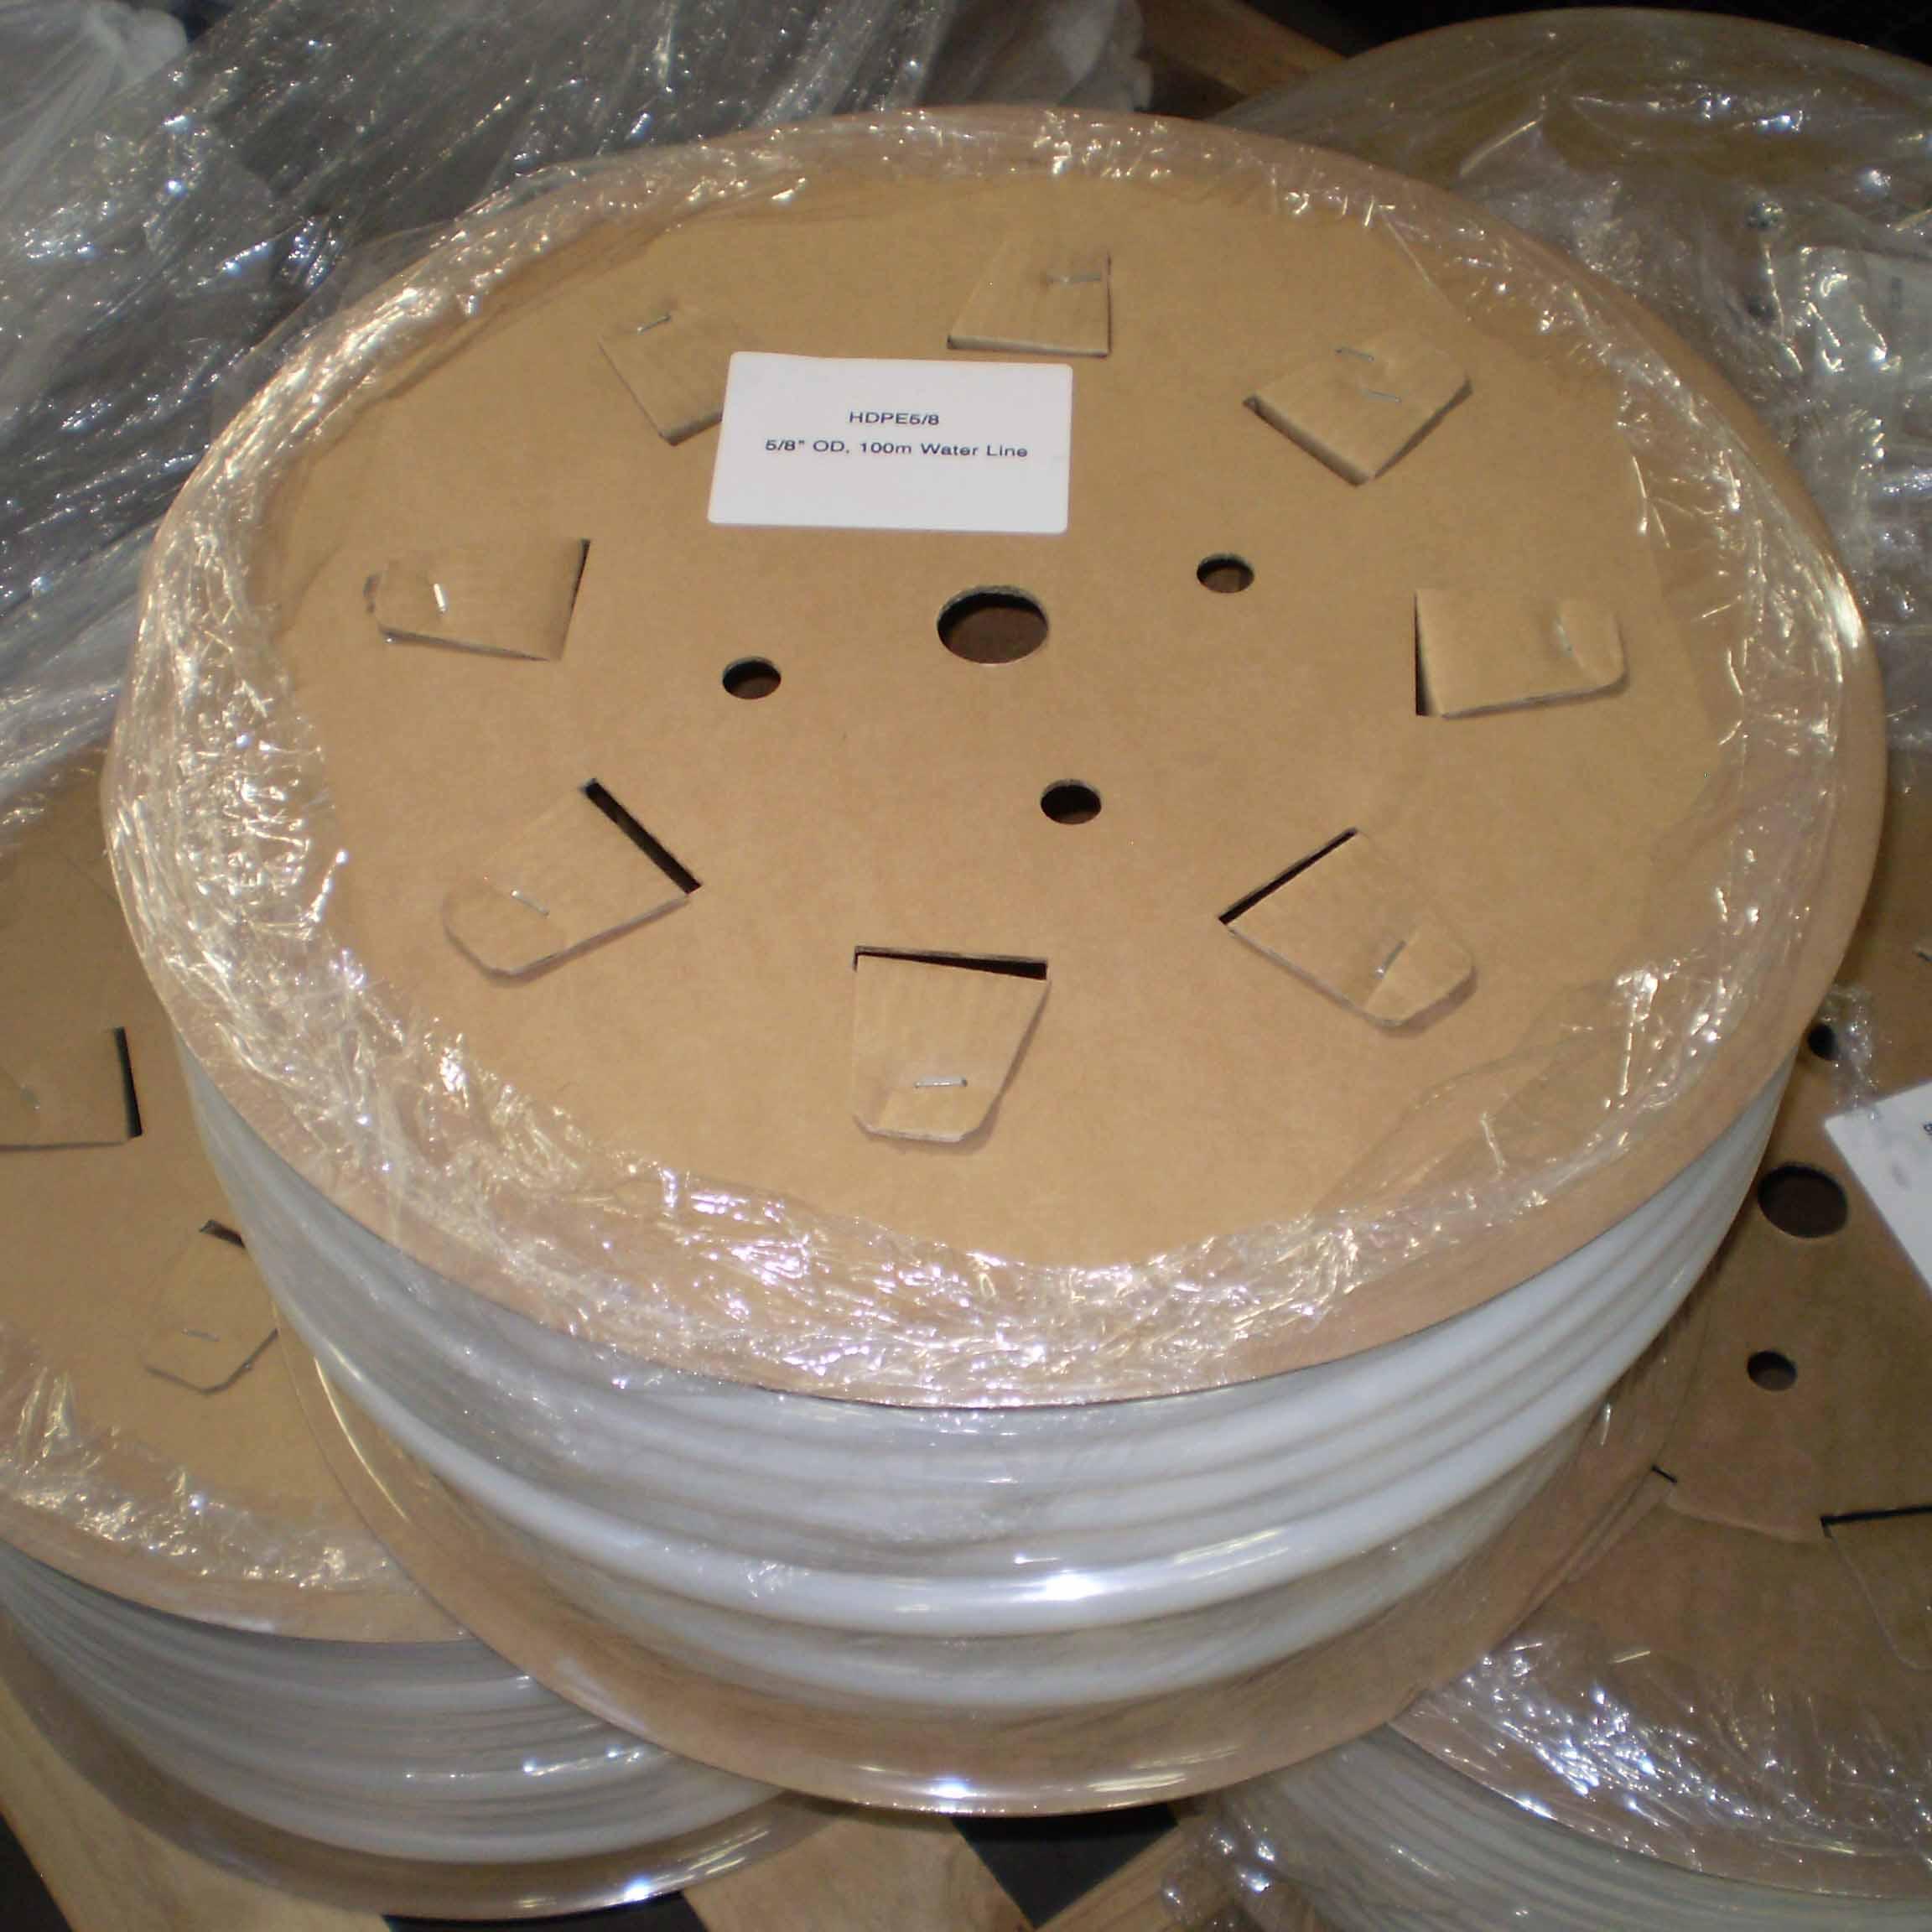 BioTubing – Landfill Biodegradable Tubing for Groundwater